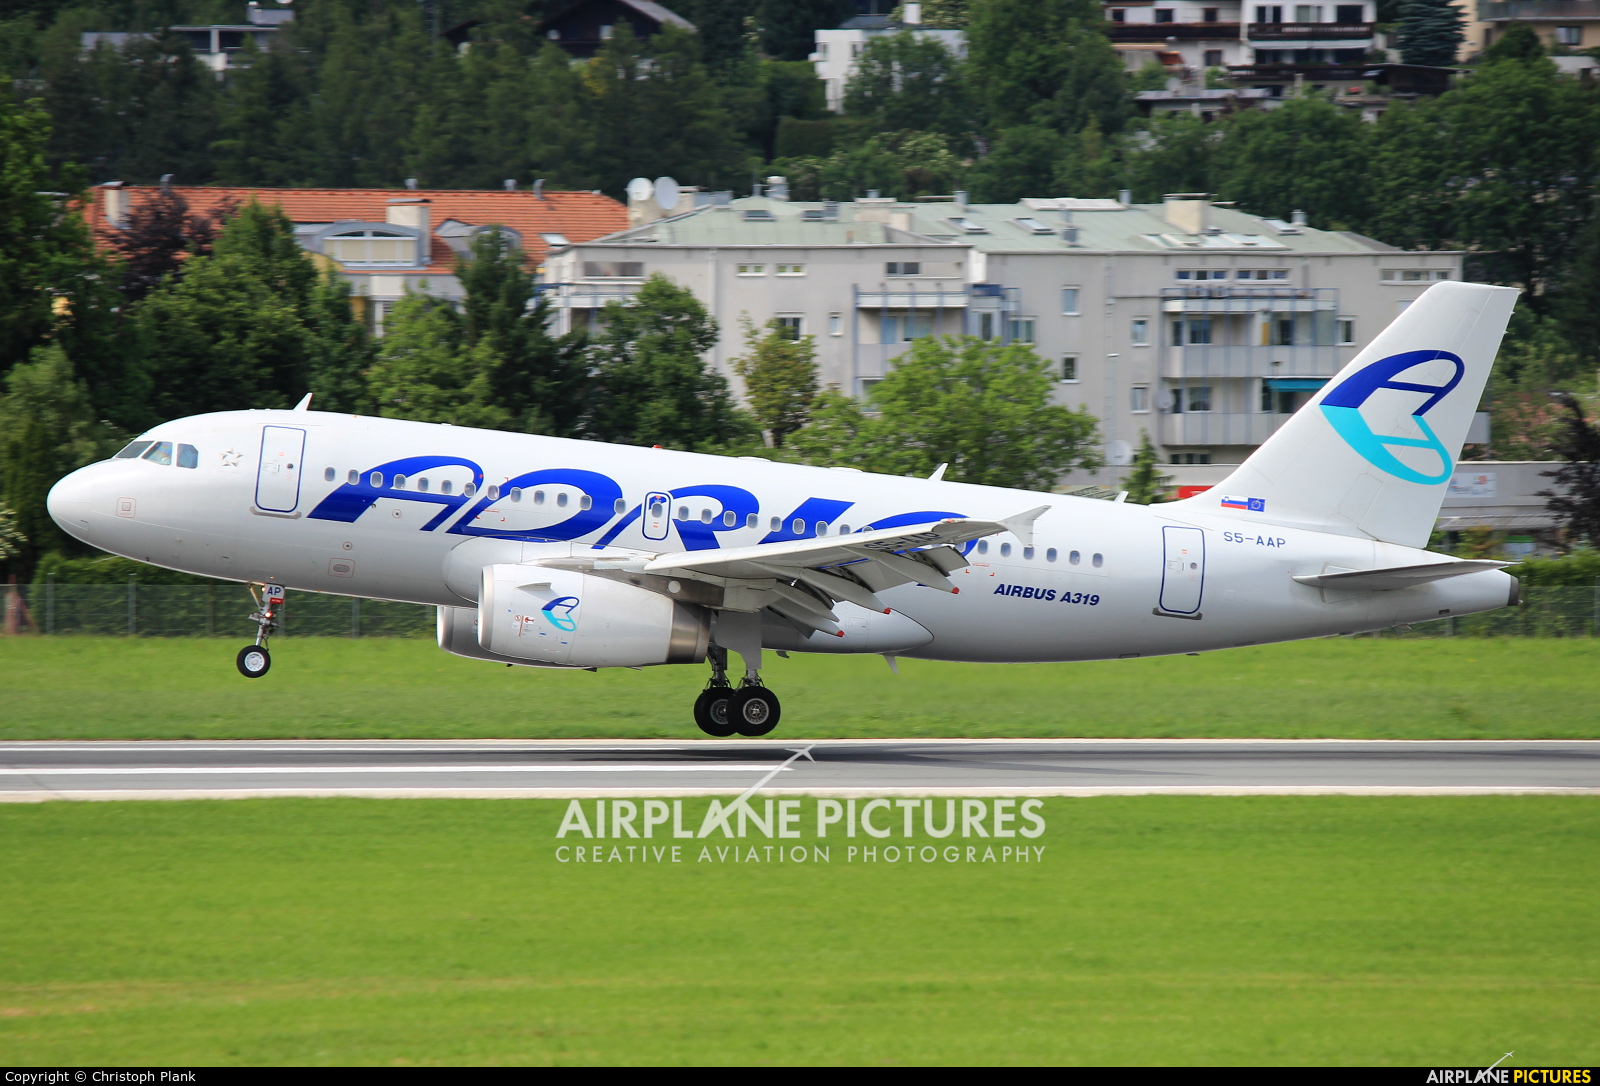 Adria Airways S5-AAP aircraft at Innsbruck